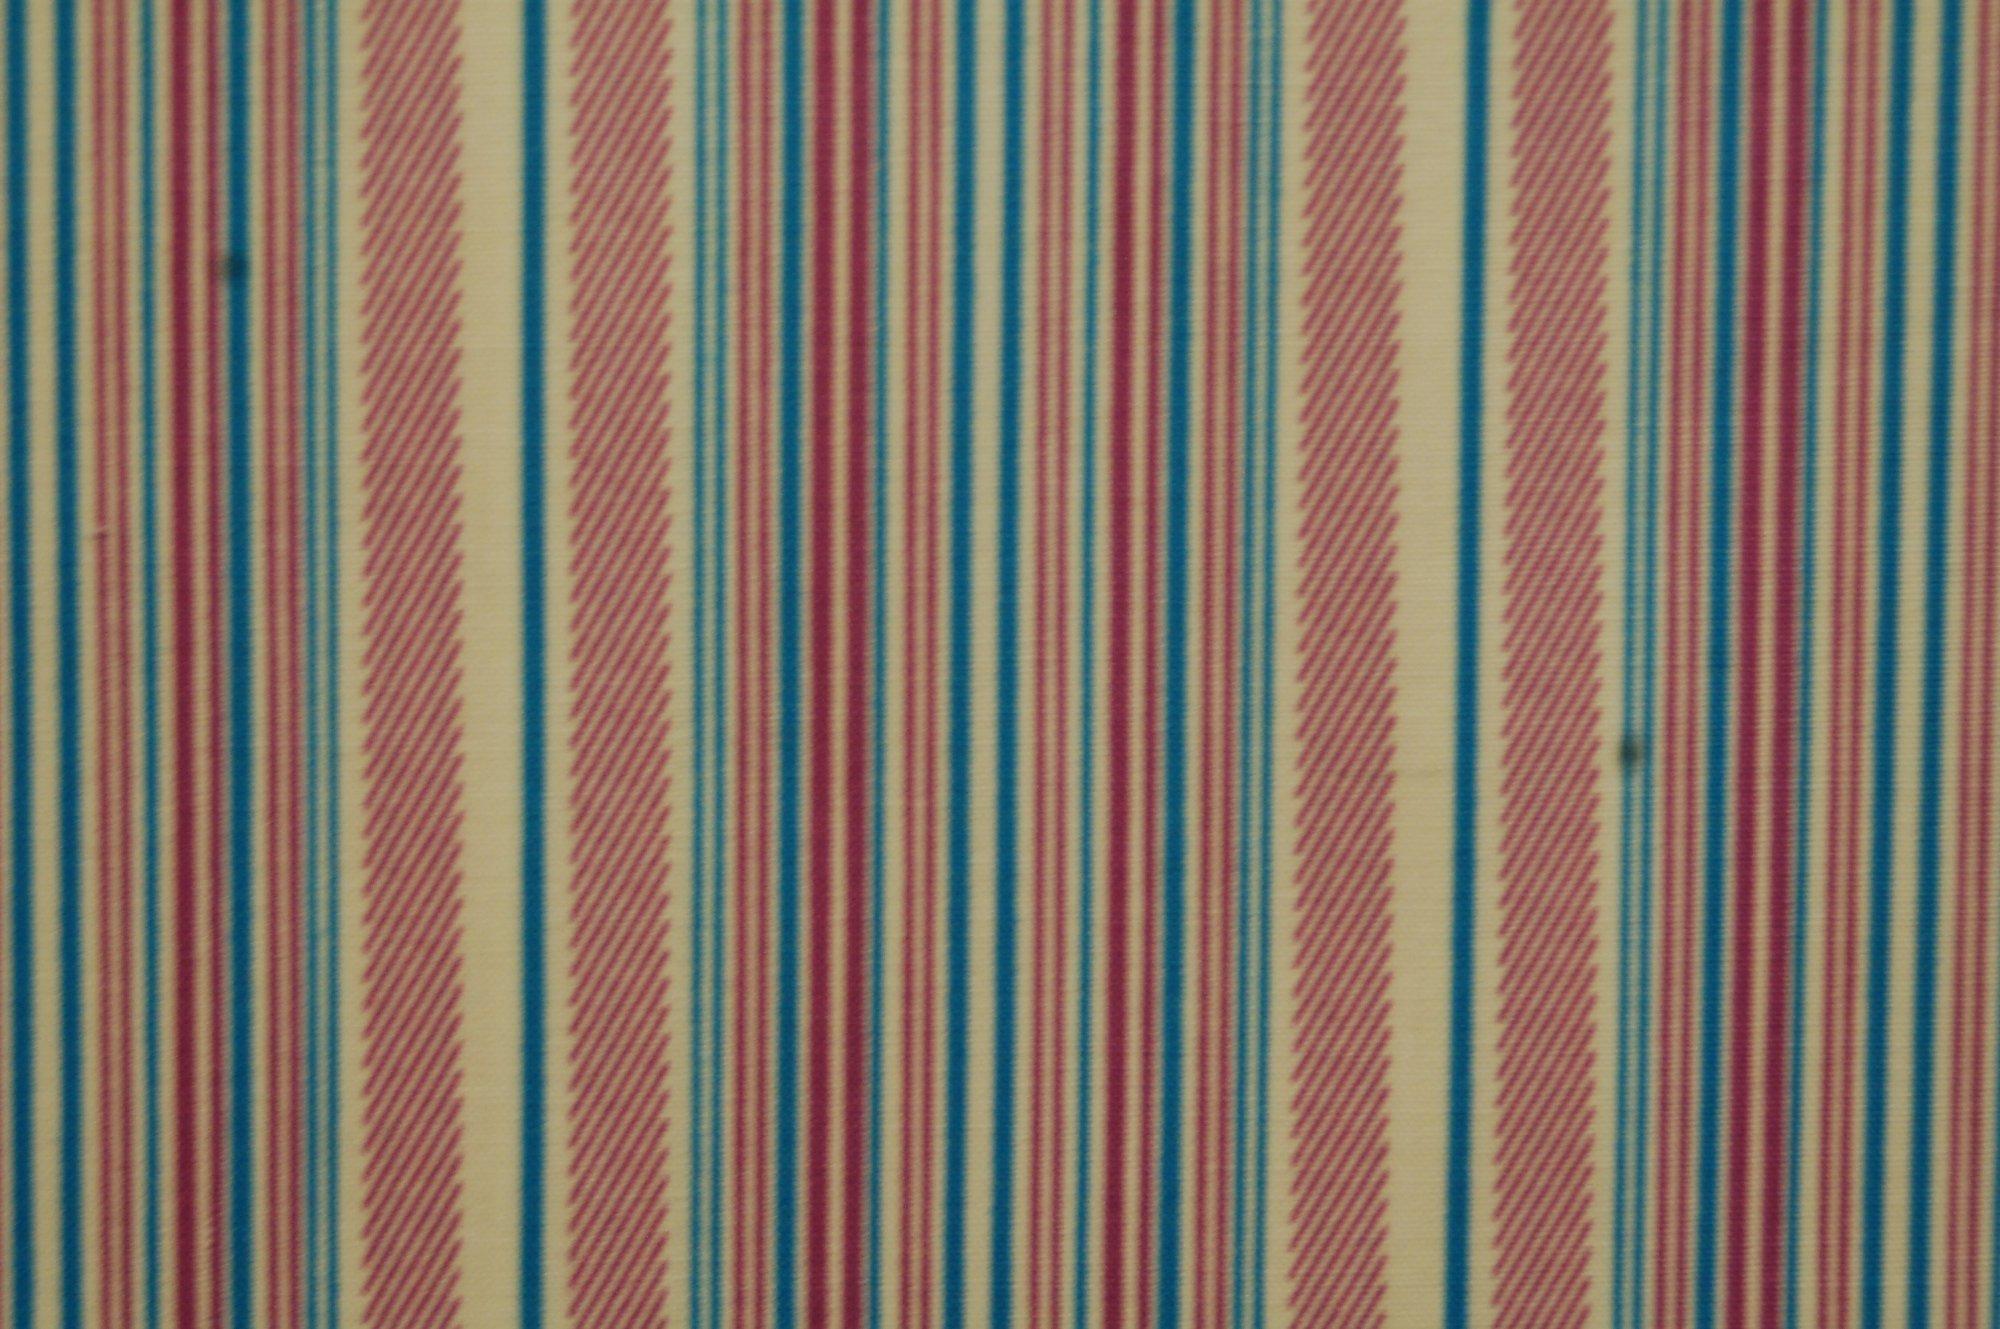 Shelburne Falls Fine Stripe (Lilac) by Denyse Schmidt for Free Spirit